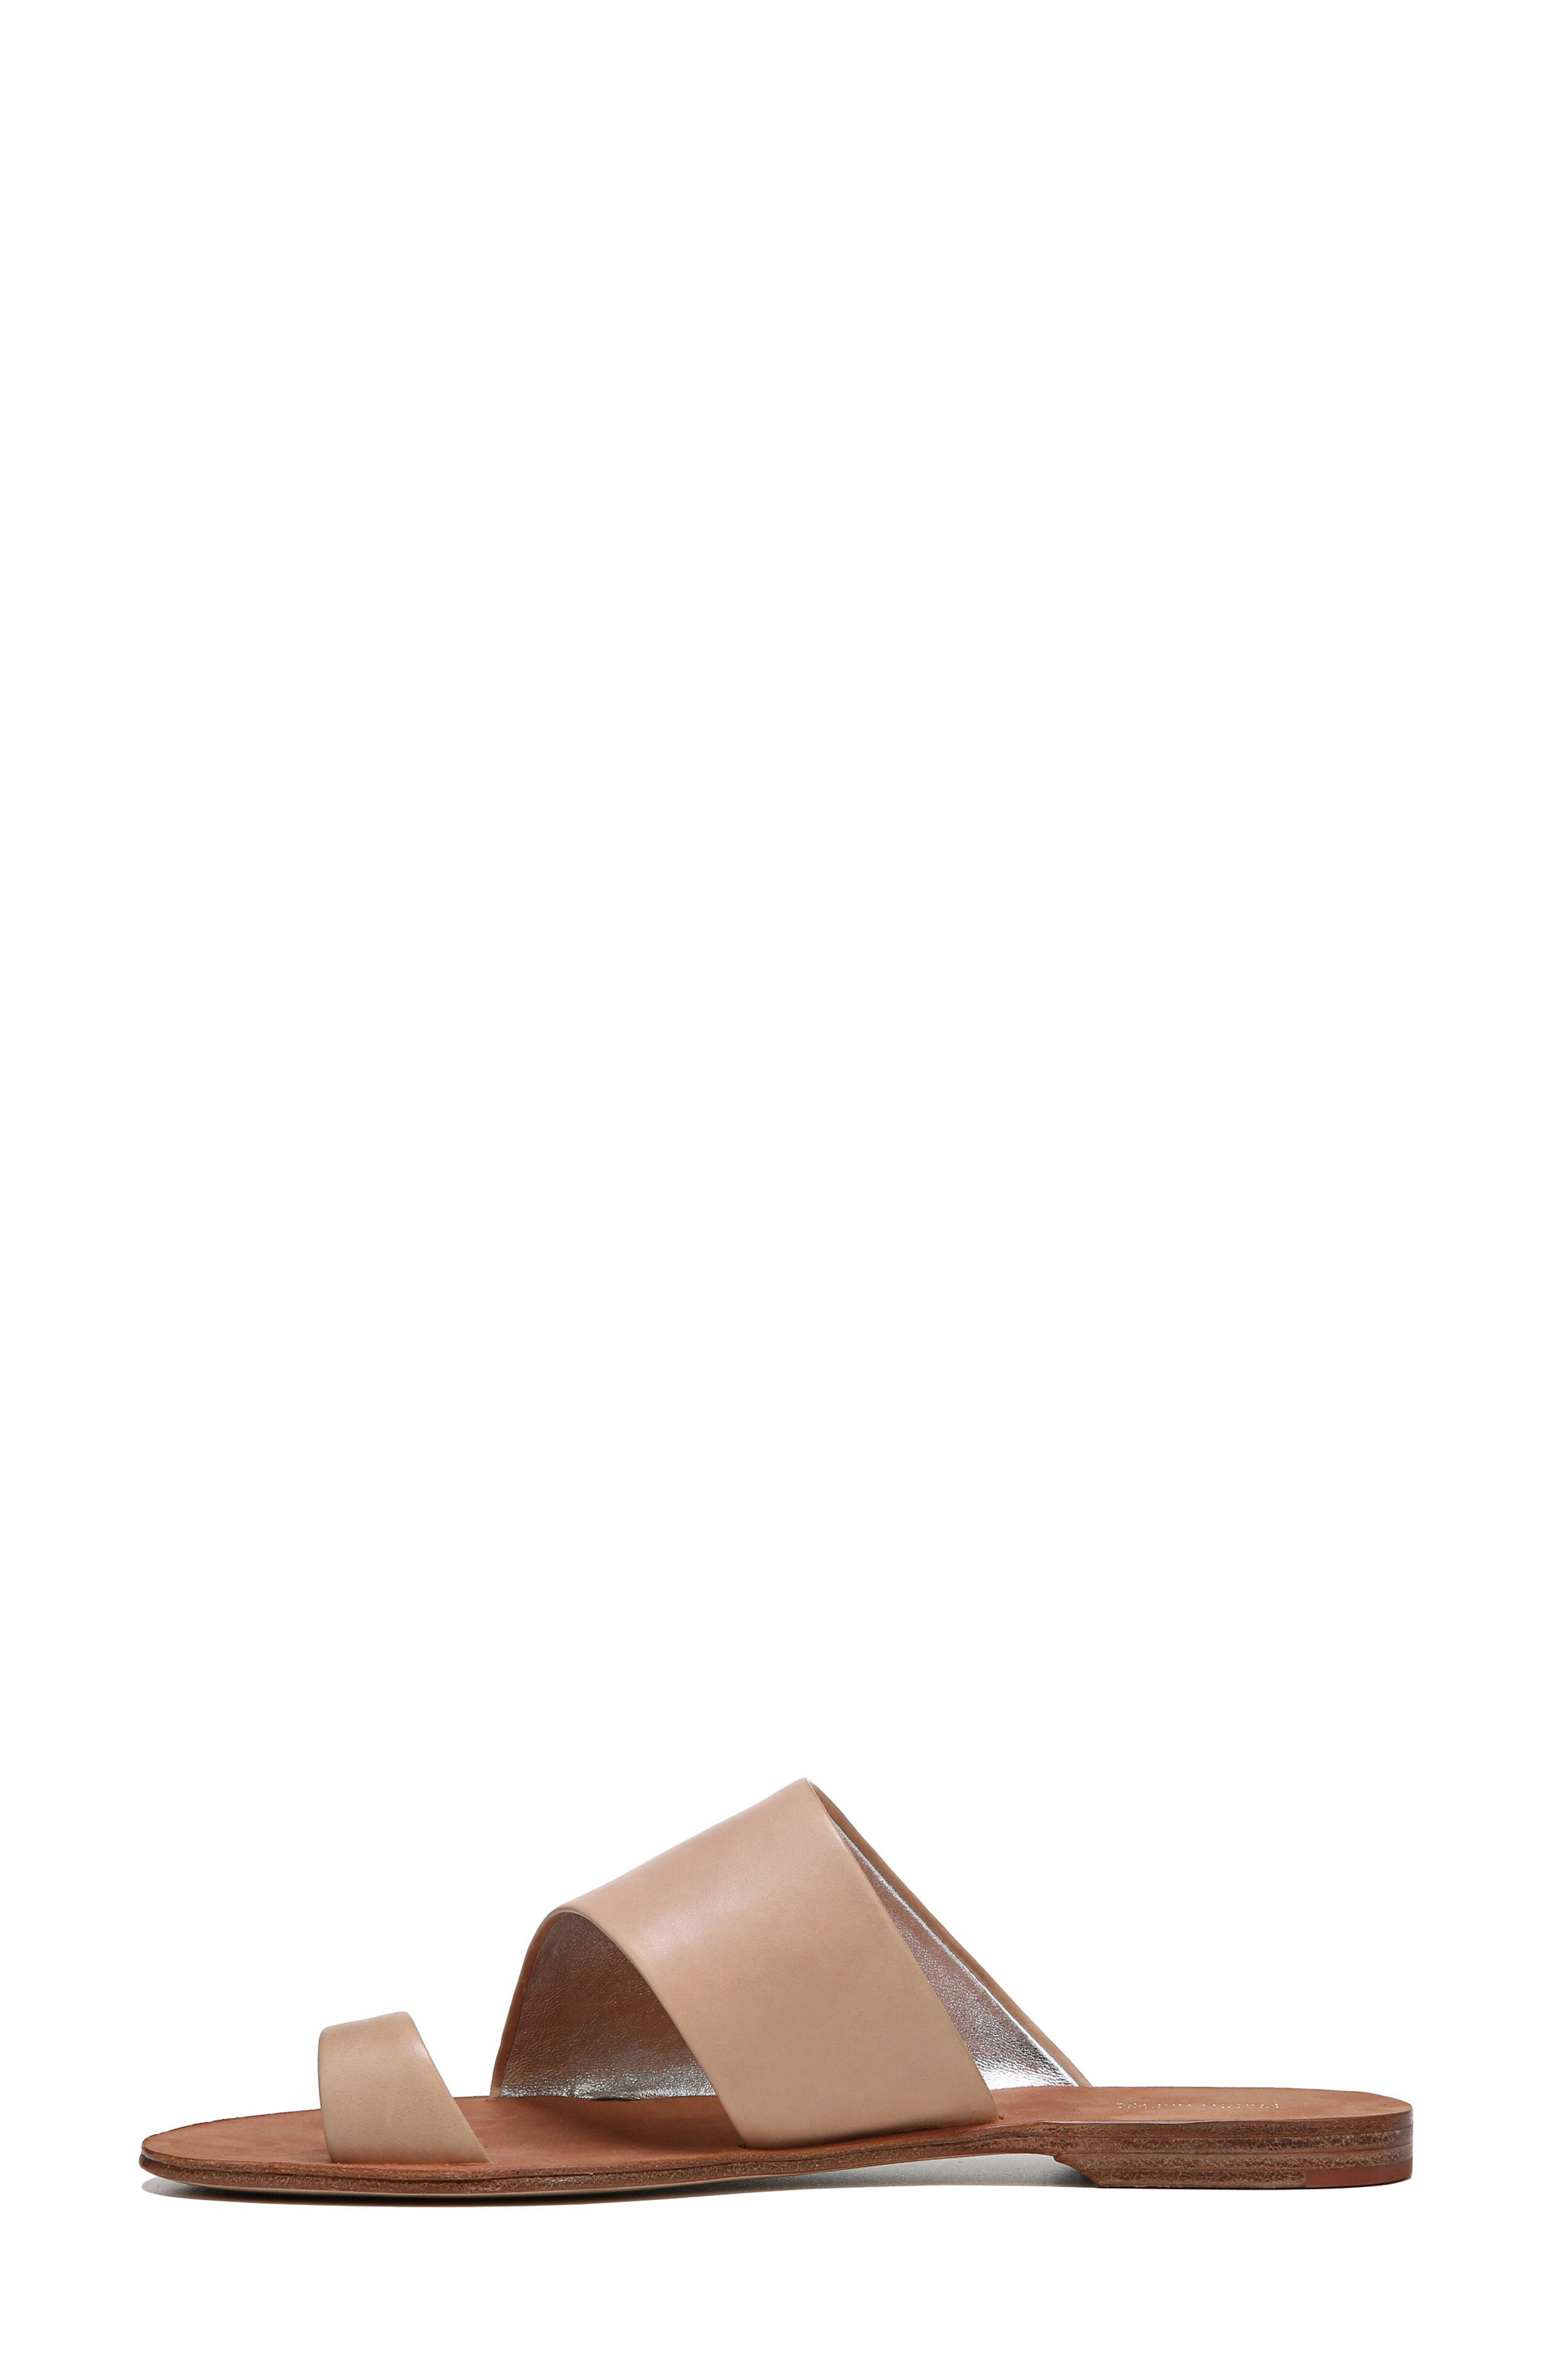 Brittany Asymmetrical Flat Sandal,                             Alternate thumbnail 3, color,                             202